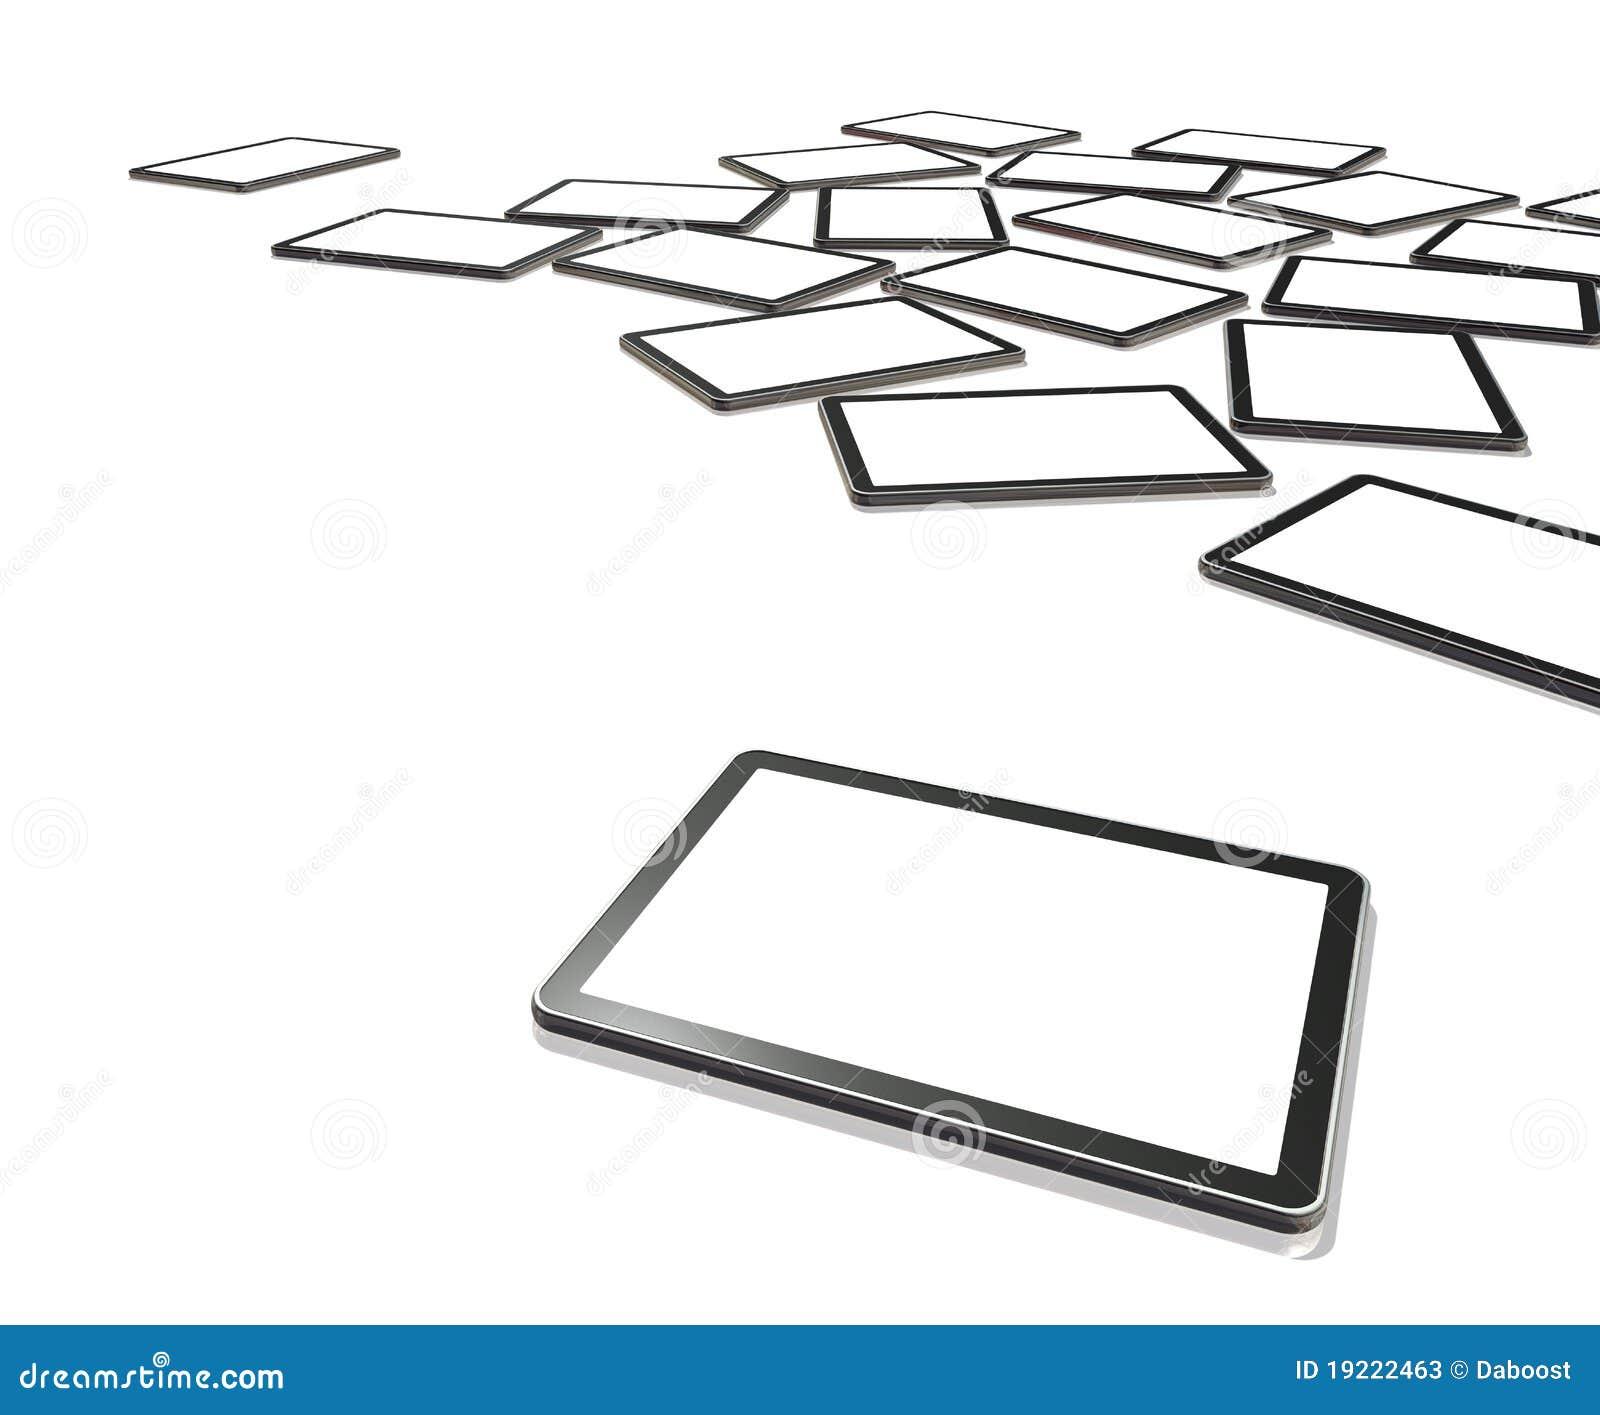 3D TV screens, digital tablet PC